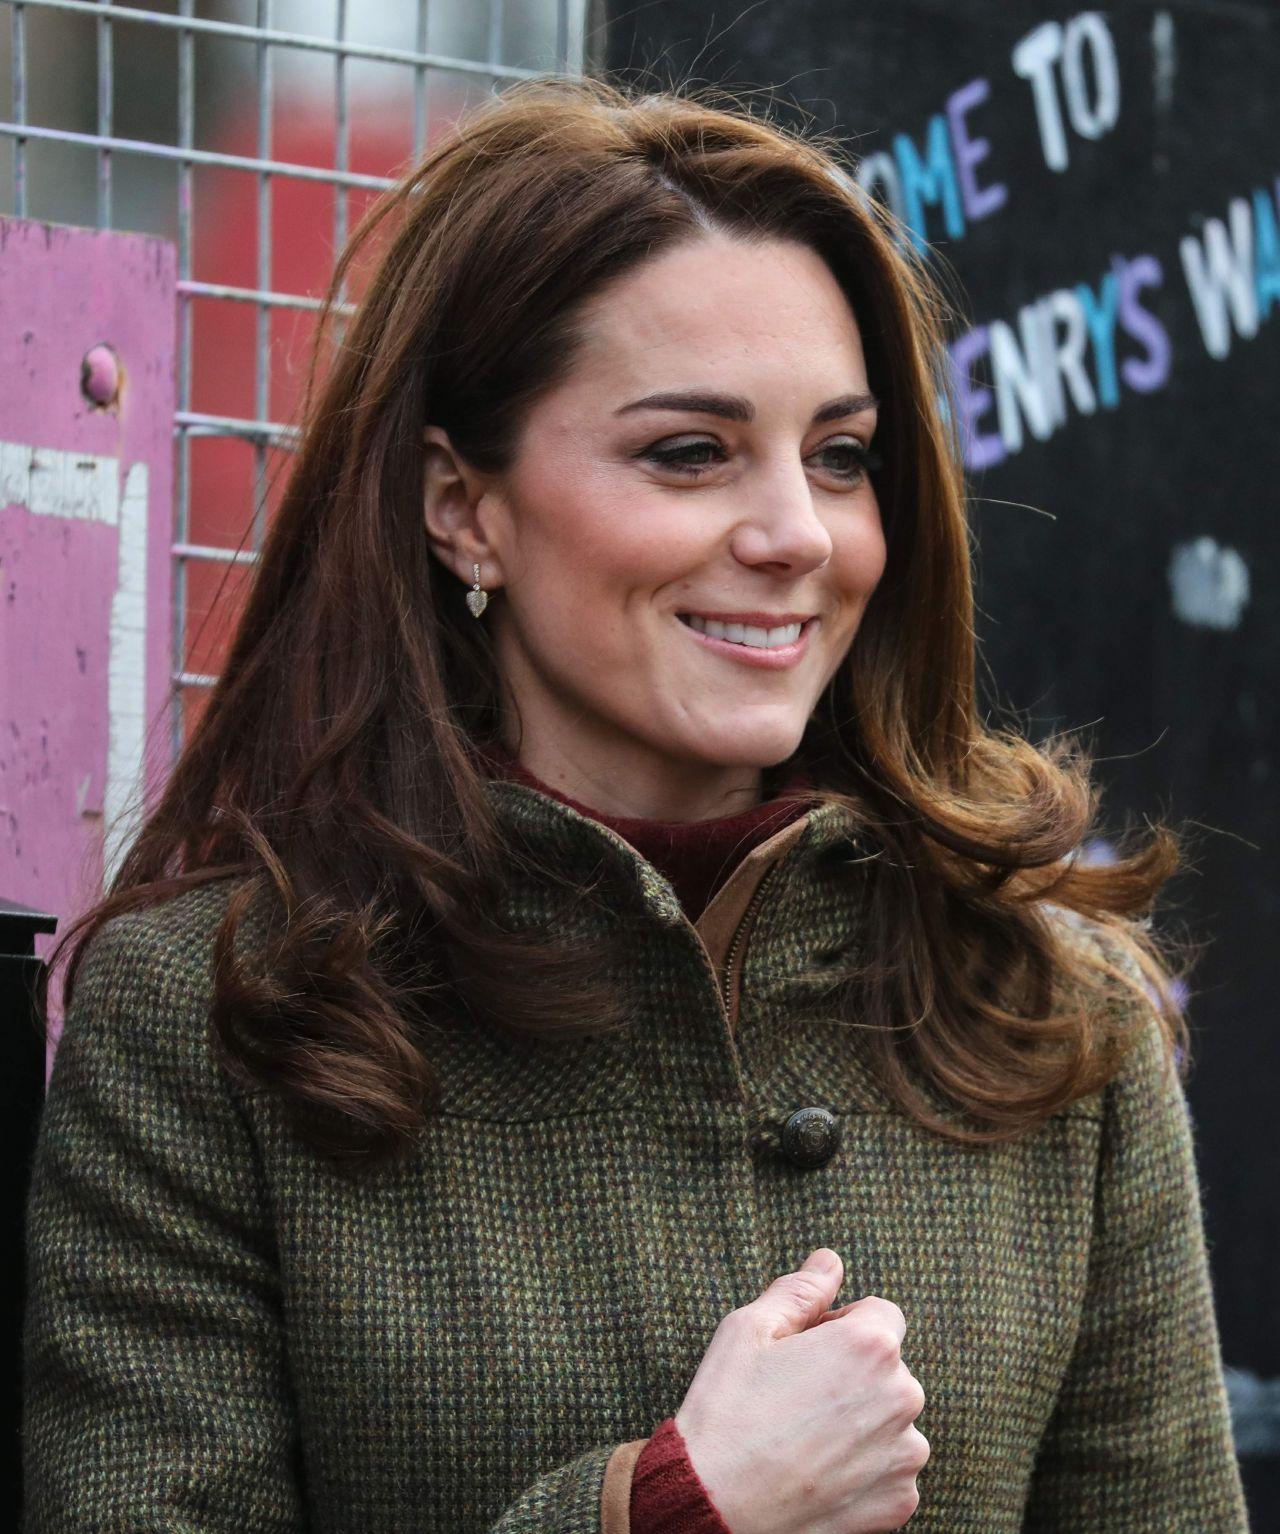 Kate Middleton  Visits the King Henrys Walk Garden in